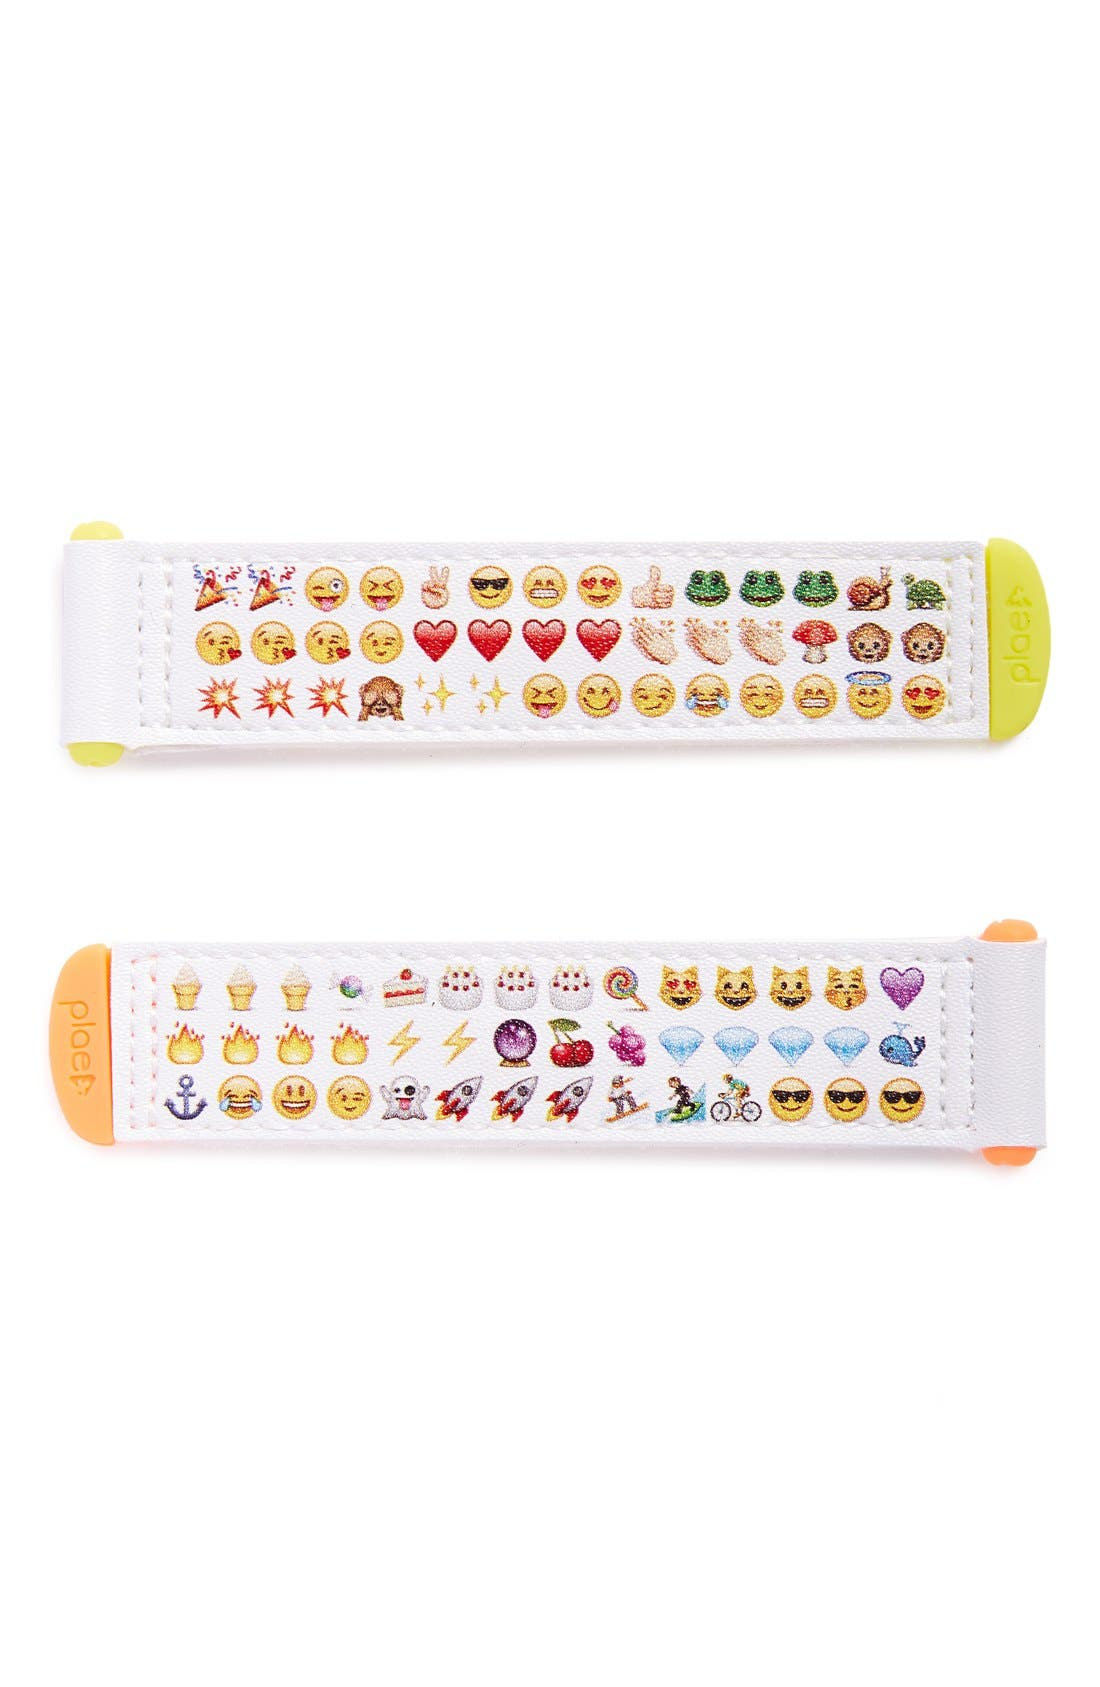 'Emoji' Interchangeable Tabs,                             Main thumbnail 1, color,                             700